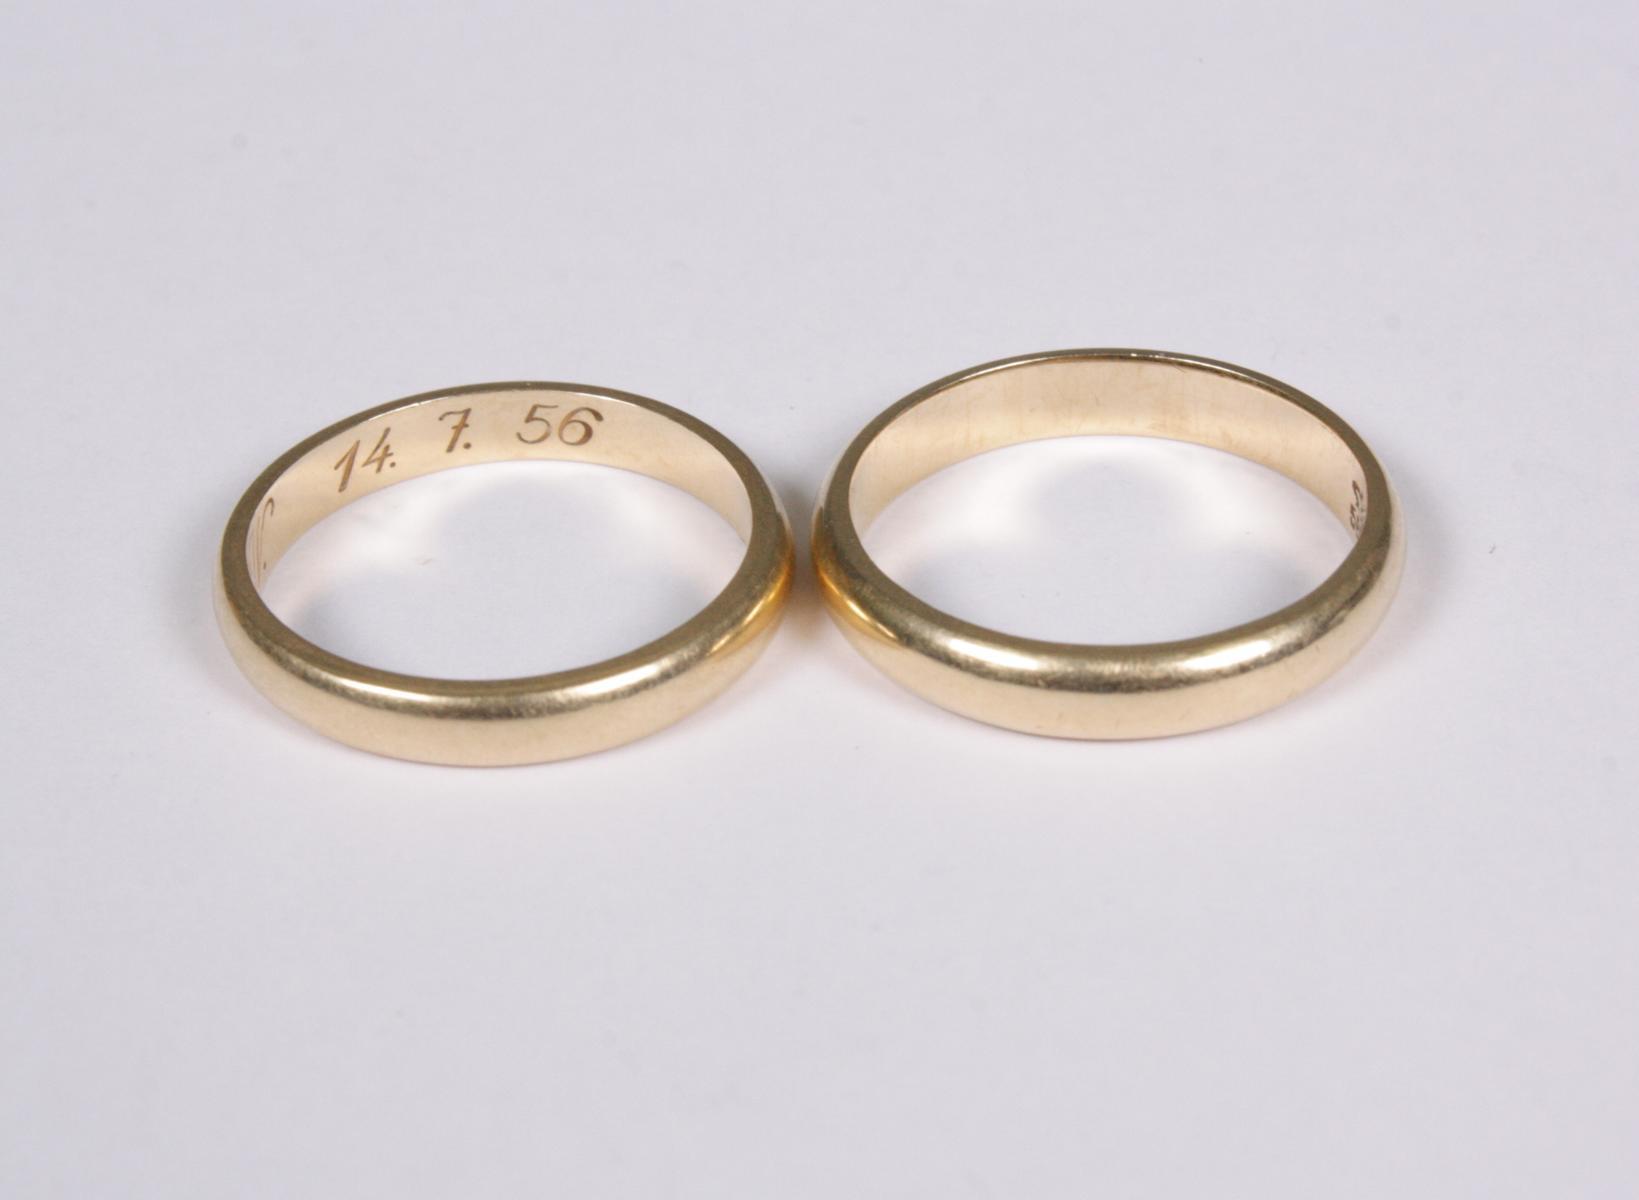 Paar Eheringe, 14 Karat Gelbgold-2